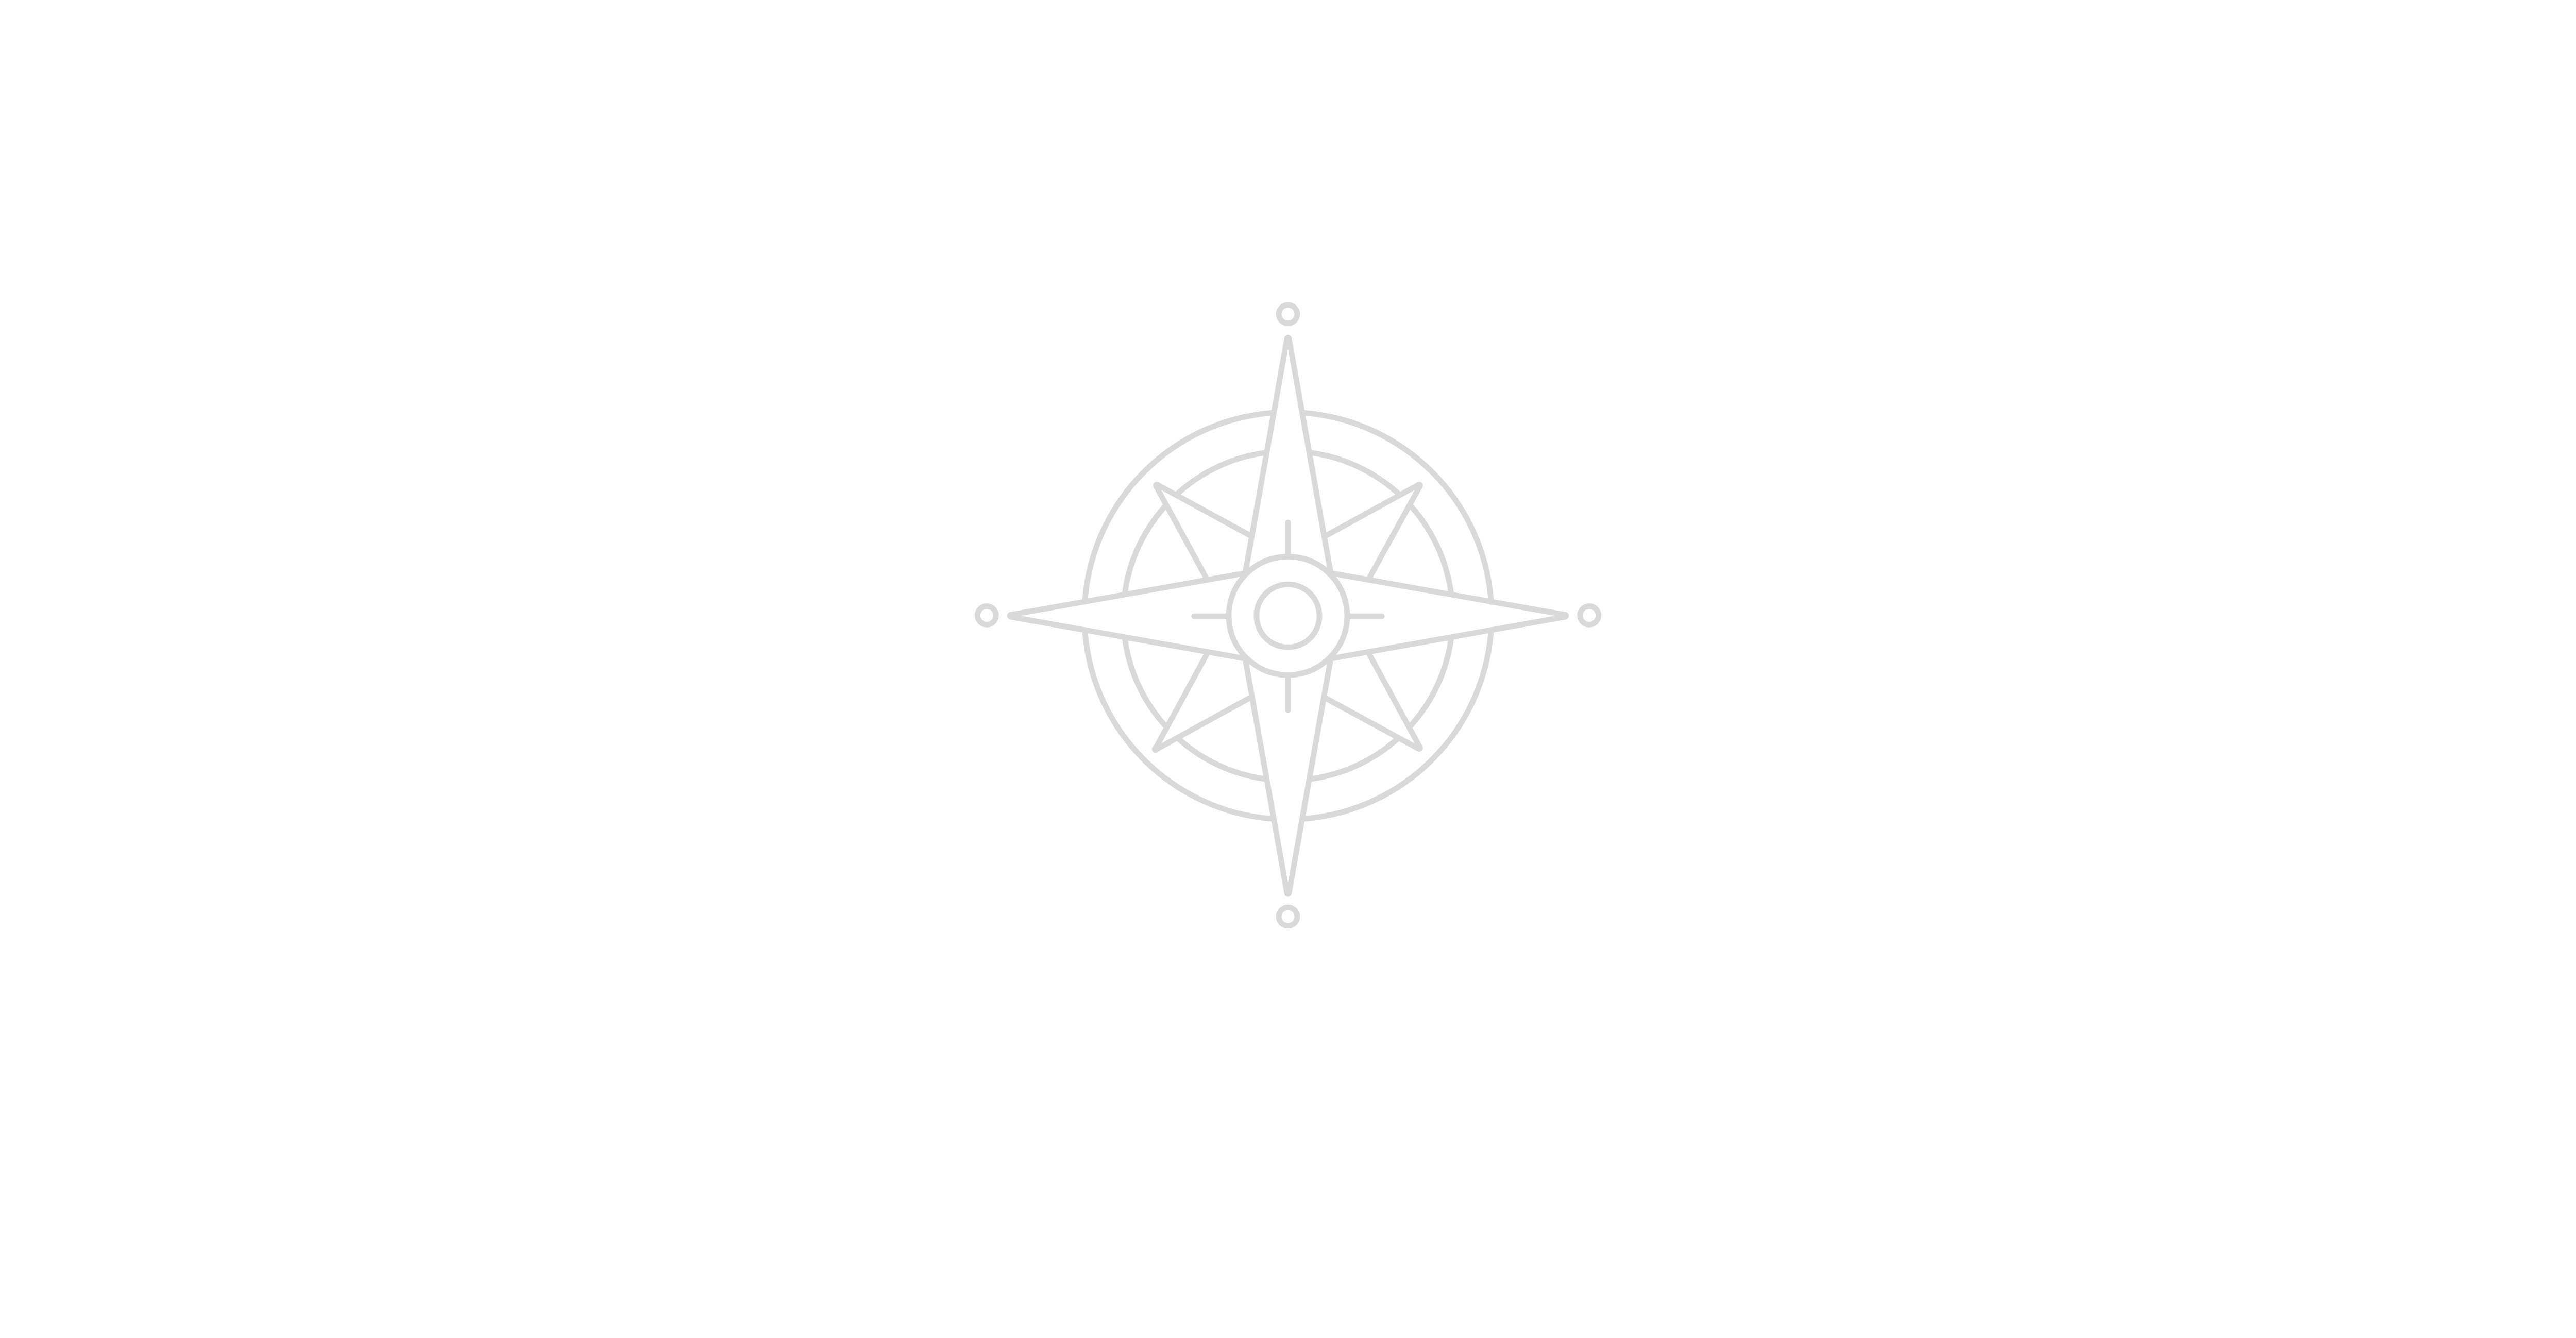 True North Counseling, LLC